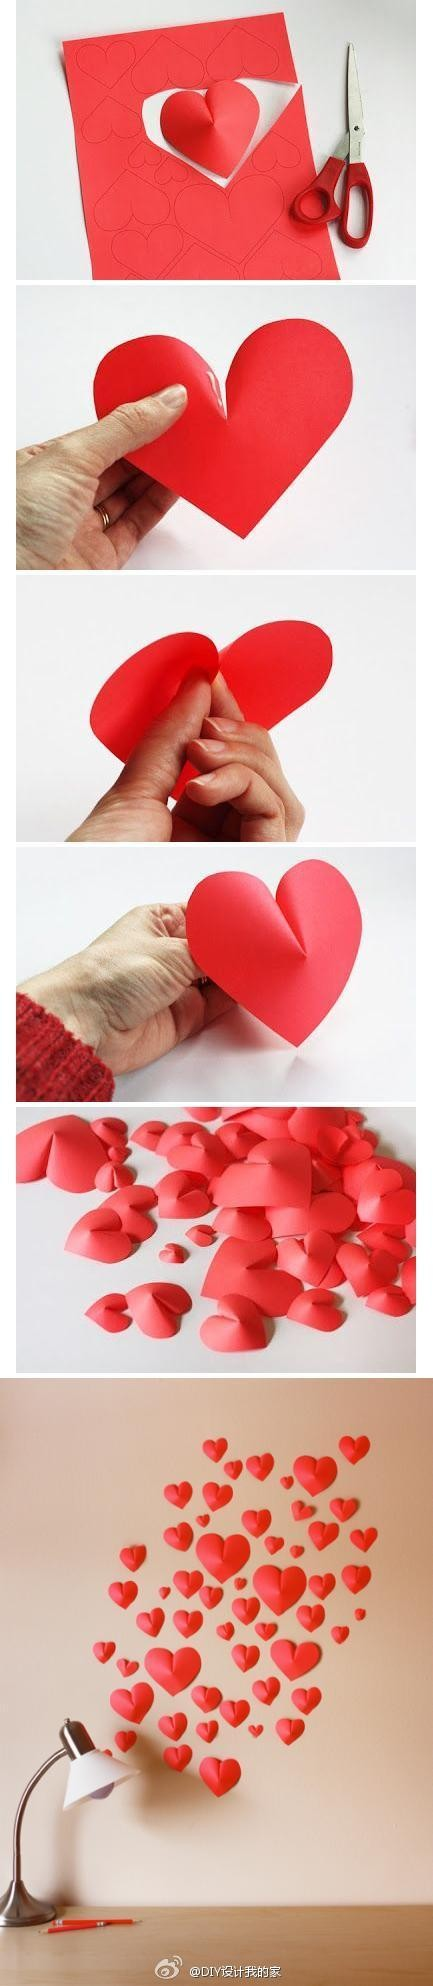 DIY心形纸墙,很有情调的墙壁装饰呢,起来给我们温馨的小屋增添更多的爱吧!